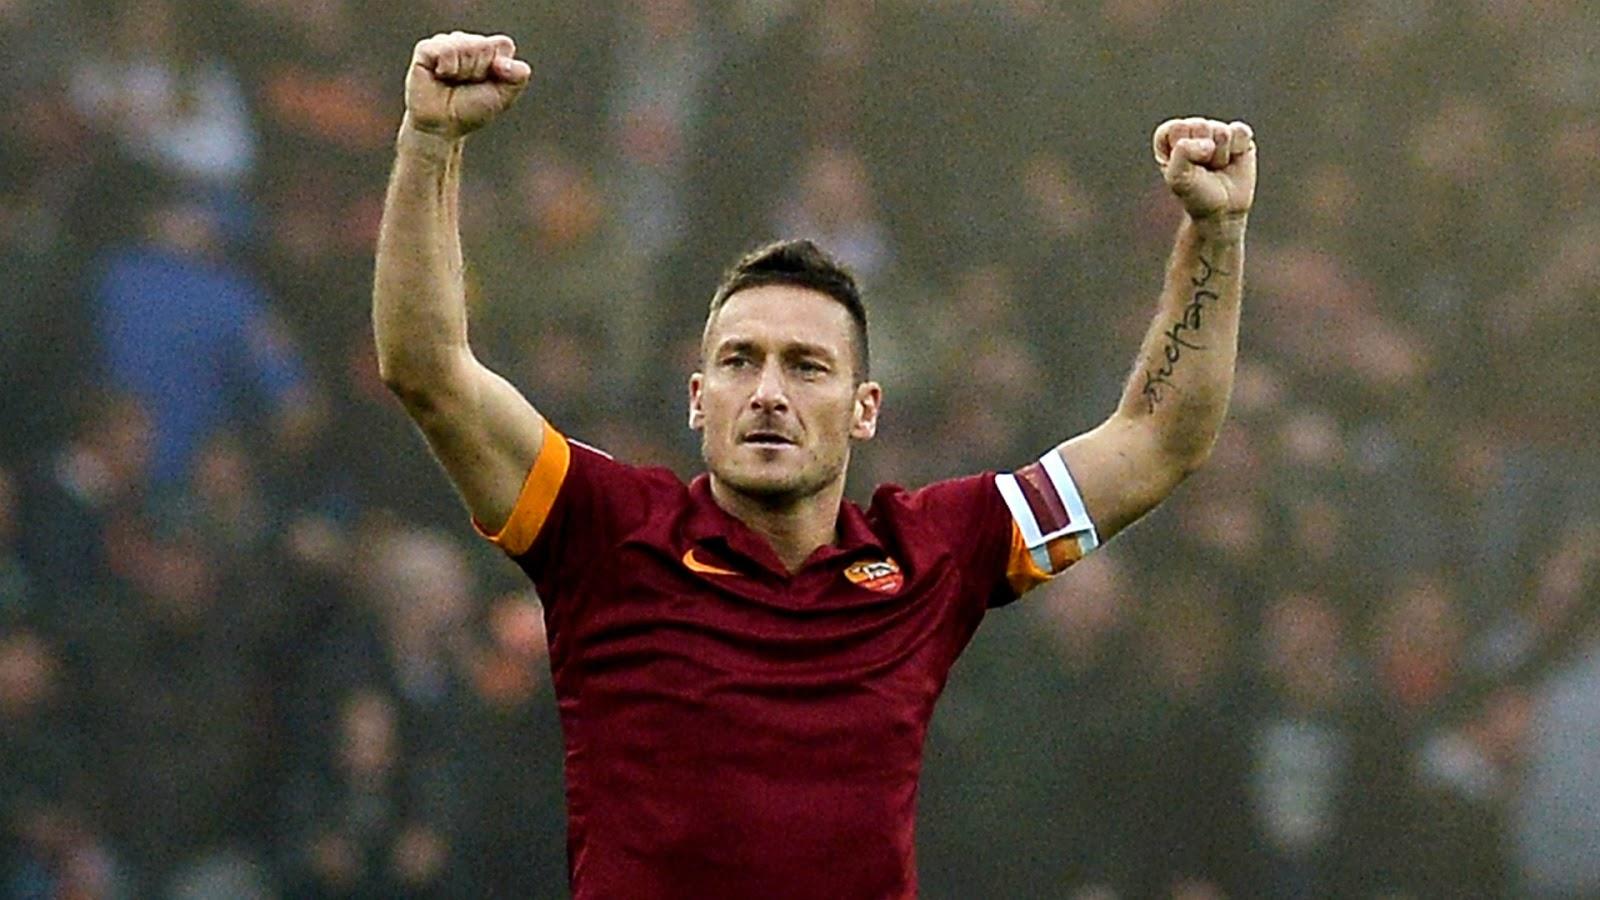 Playera, Francesco Totti, lanzada al espacio, Roma, ultima, futbolista, Vector Vega